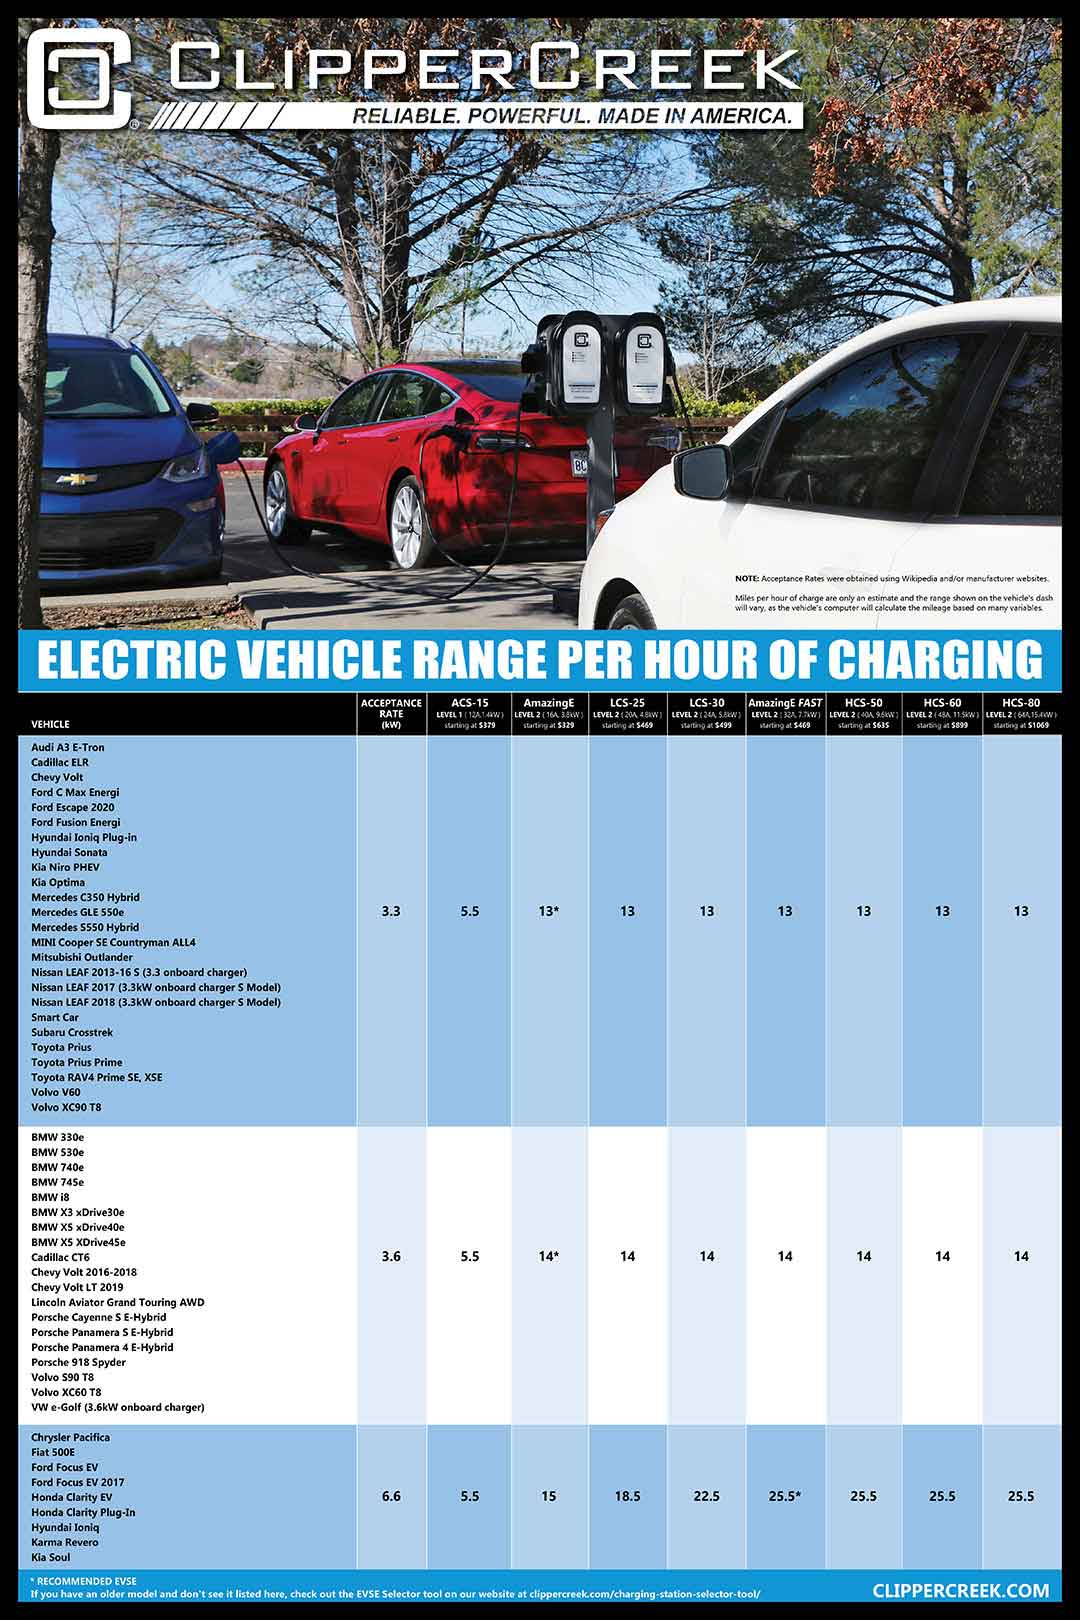 Electric Vehicle Range per Hour of Charging chart